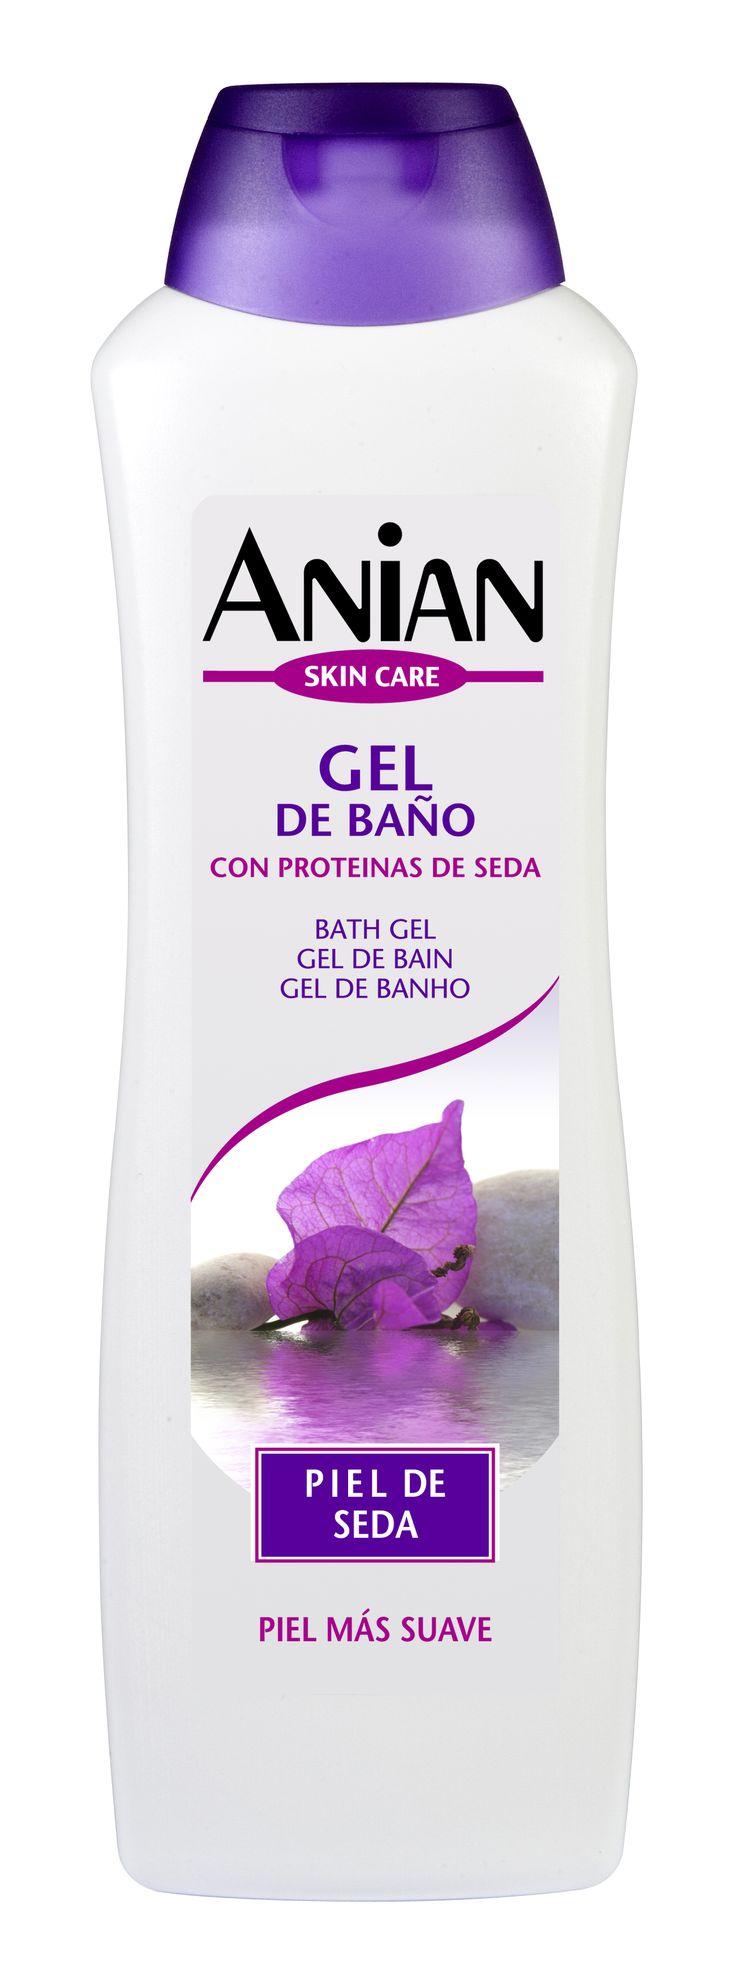 24 best lo mejor para tu belleza images on pinterest hair treatments hair care and beauty tricks - Mejor gel de bano ...